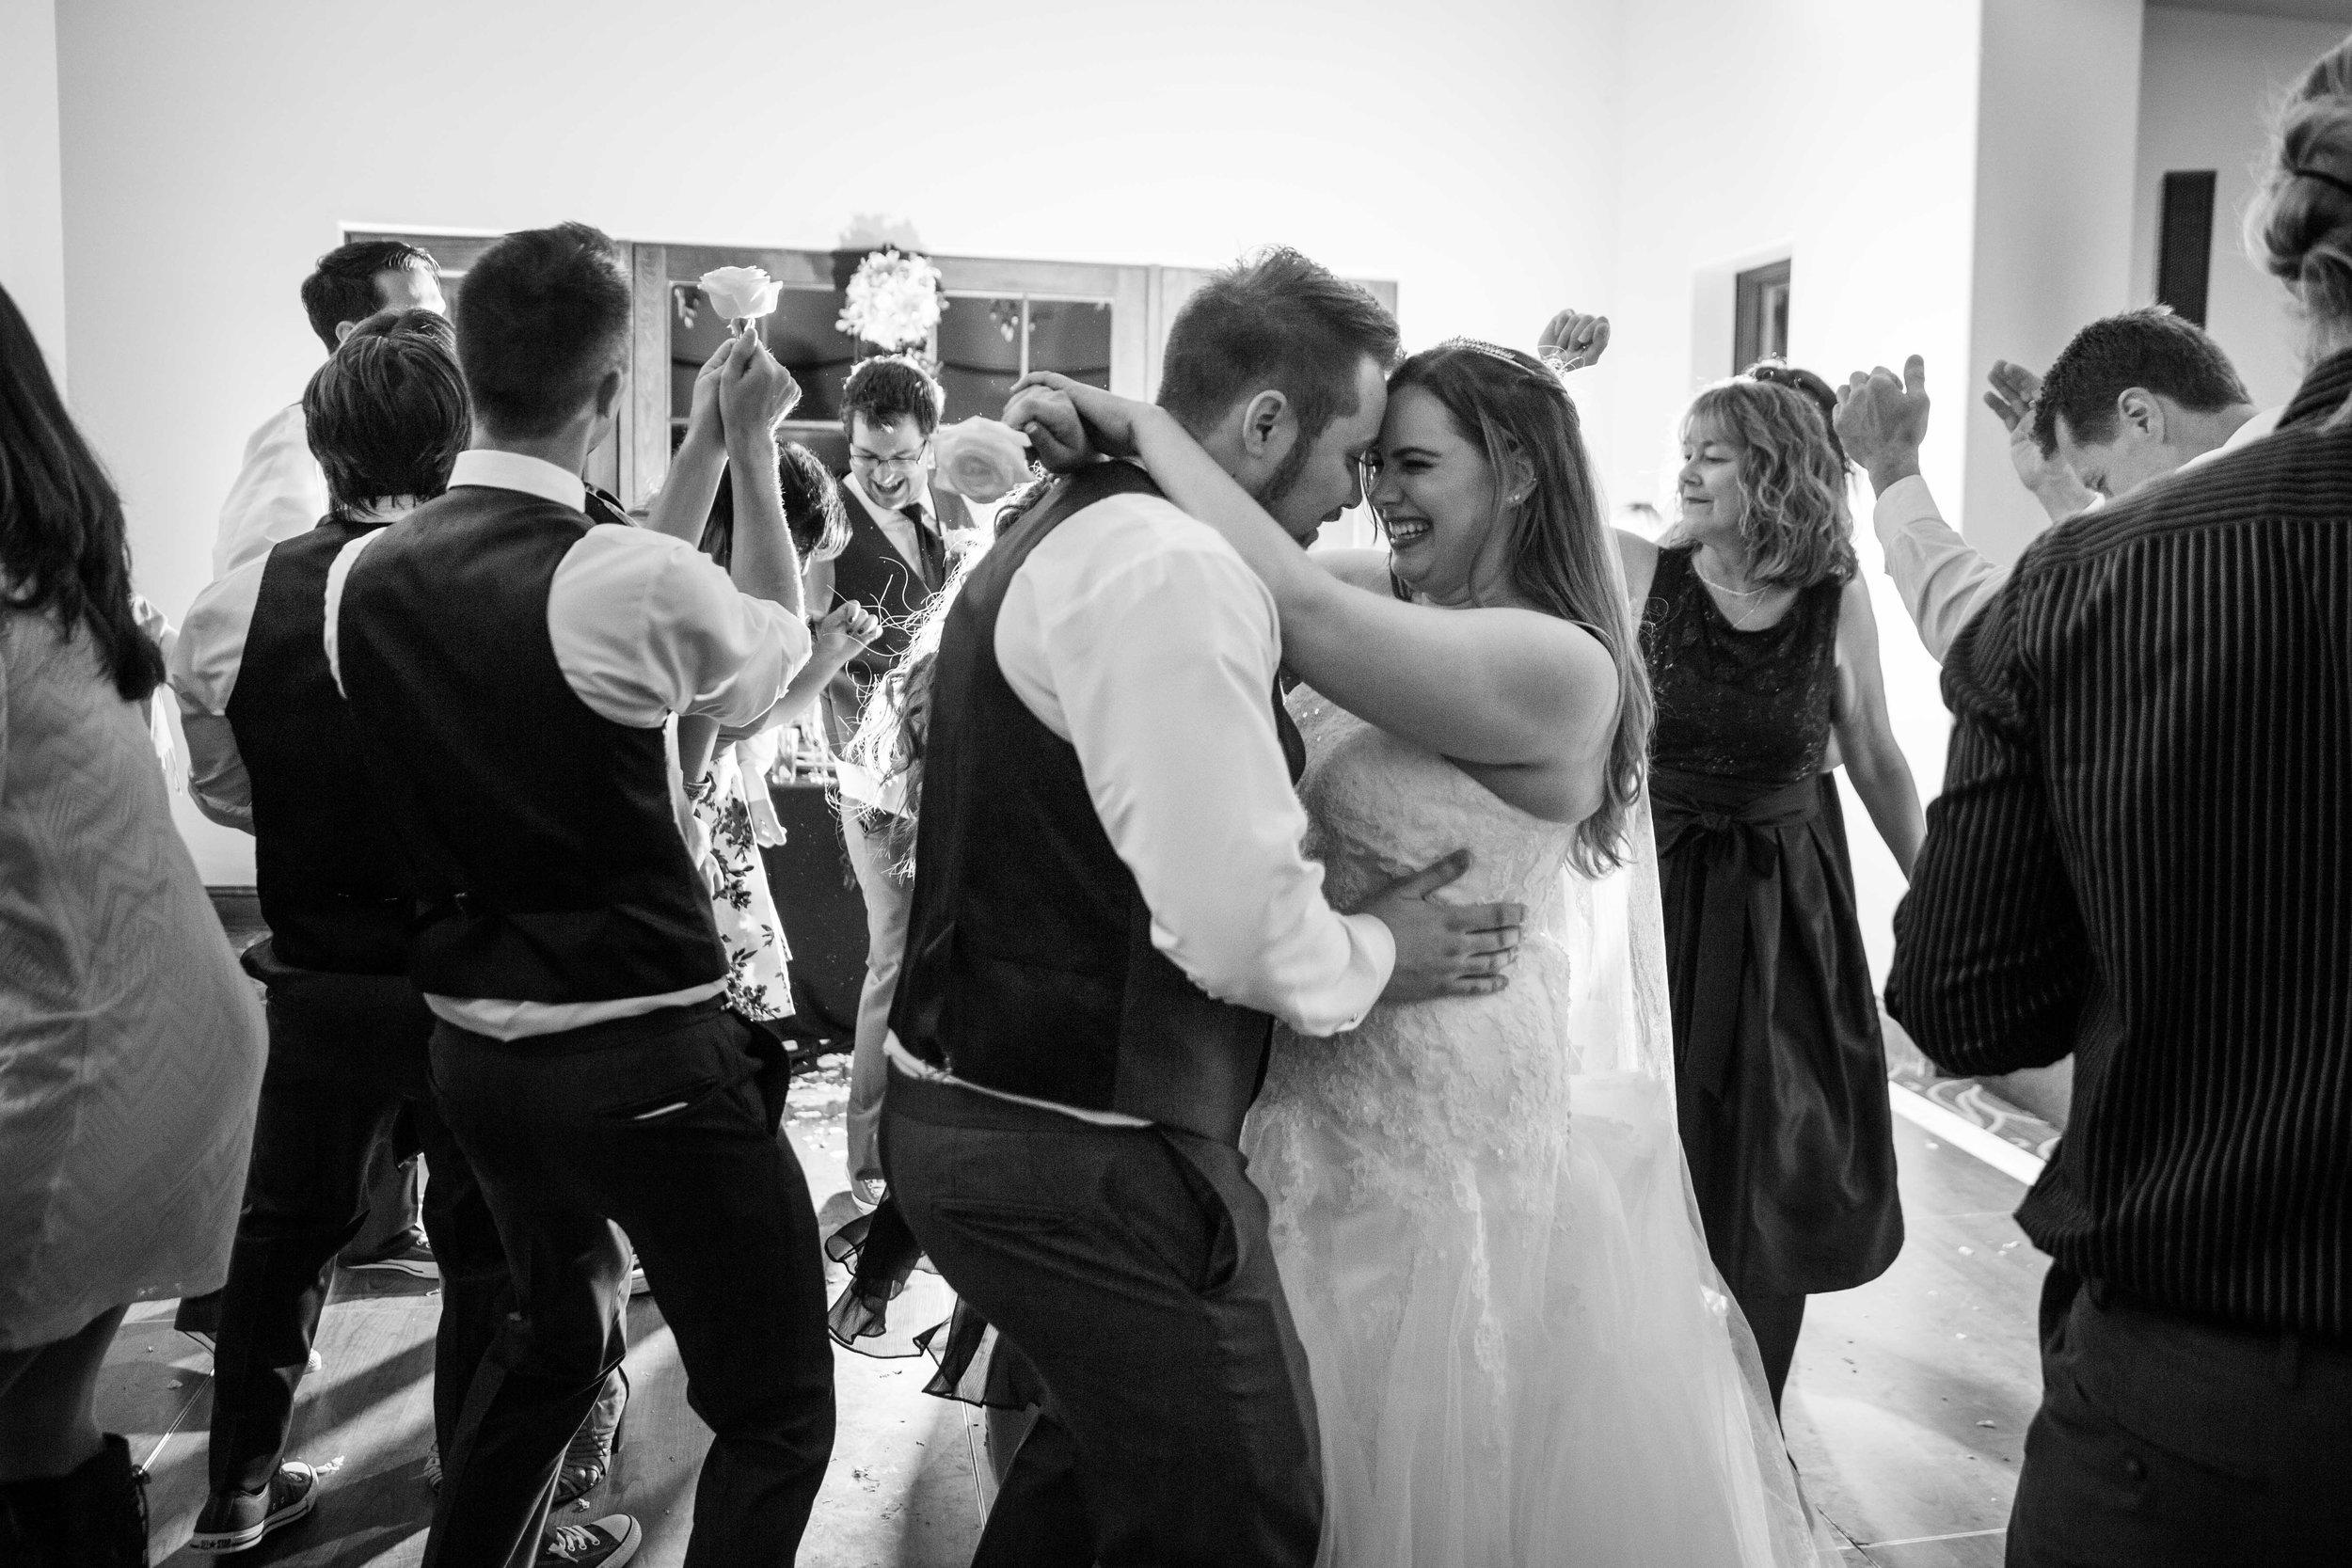 011_Aliso_Viejo_Wedding_Dance.jpg